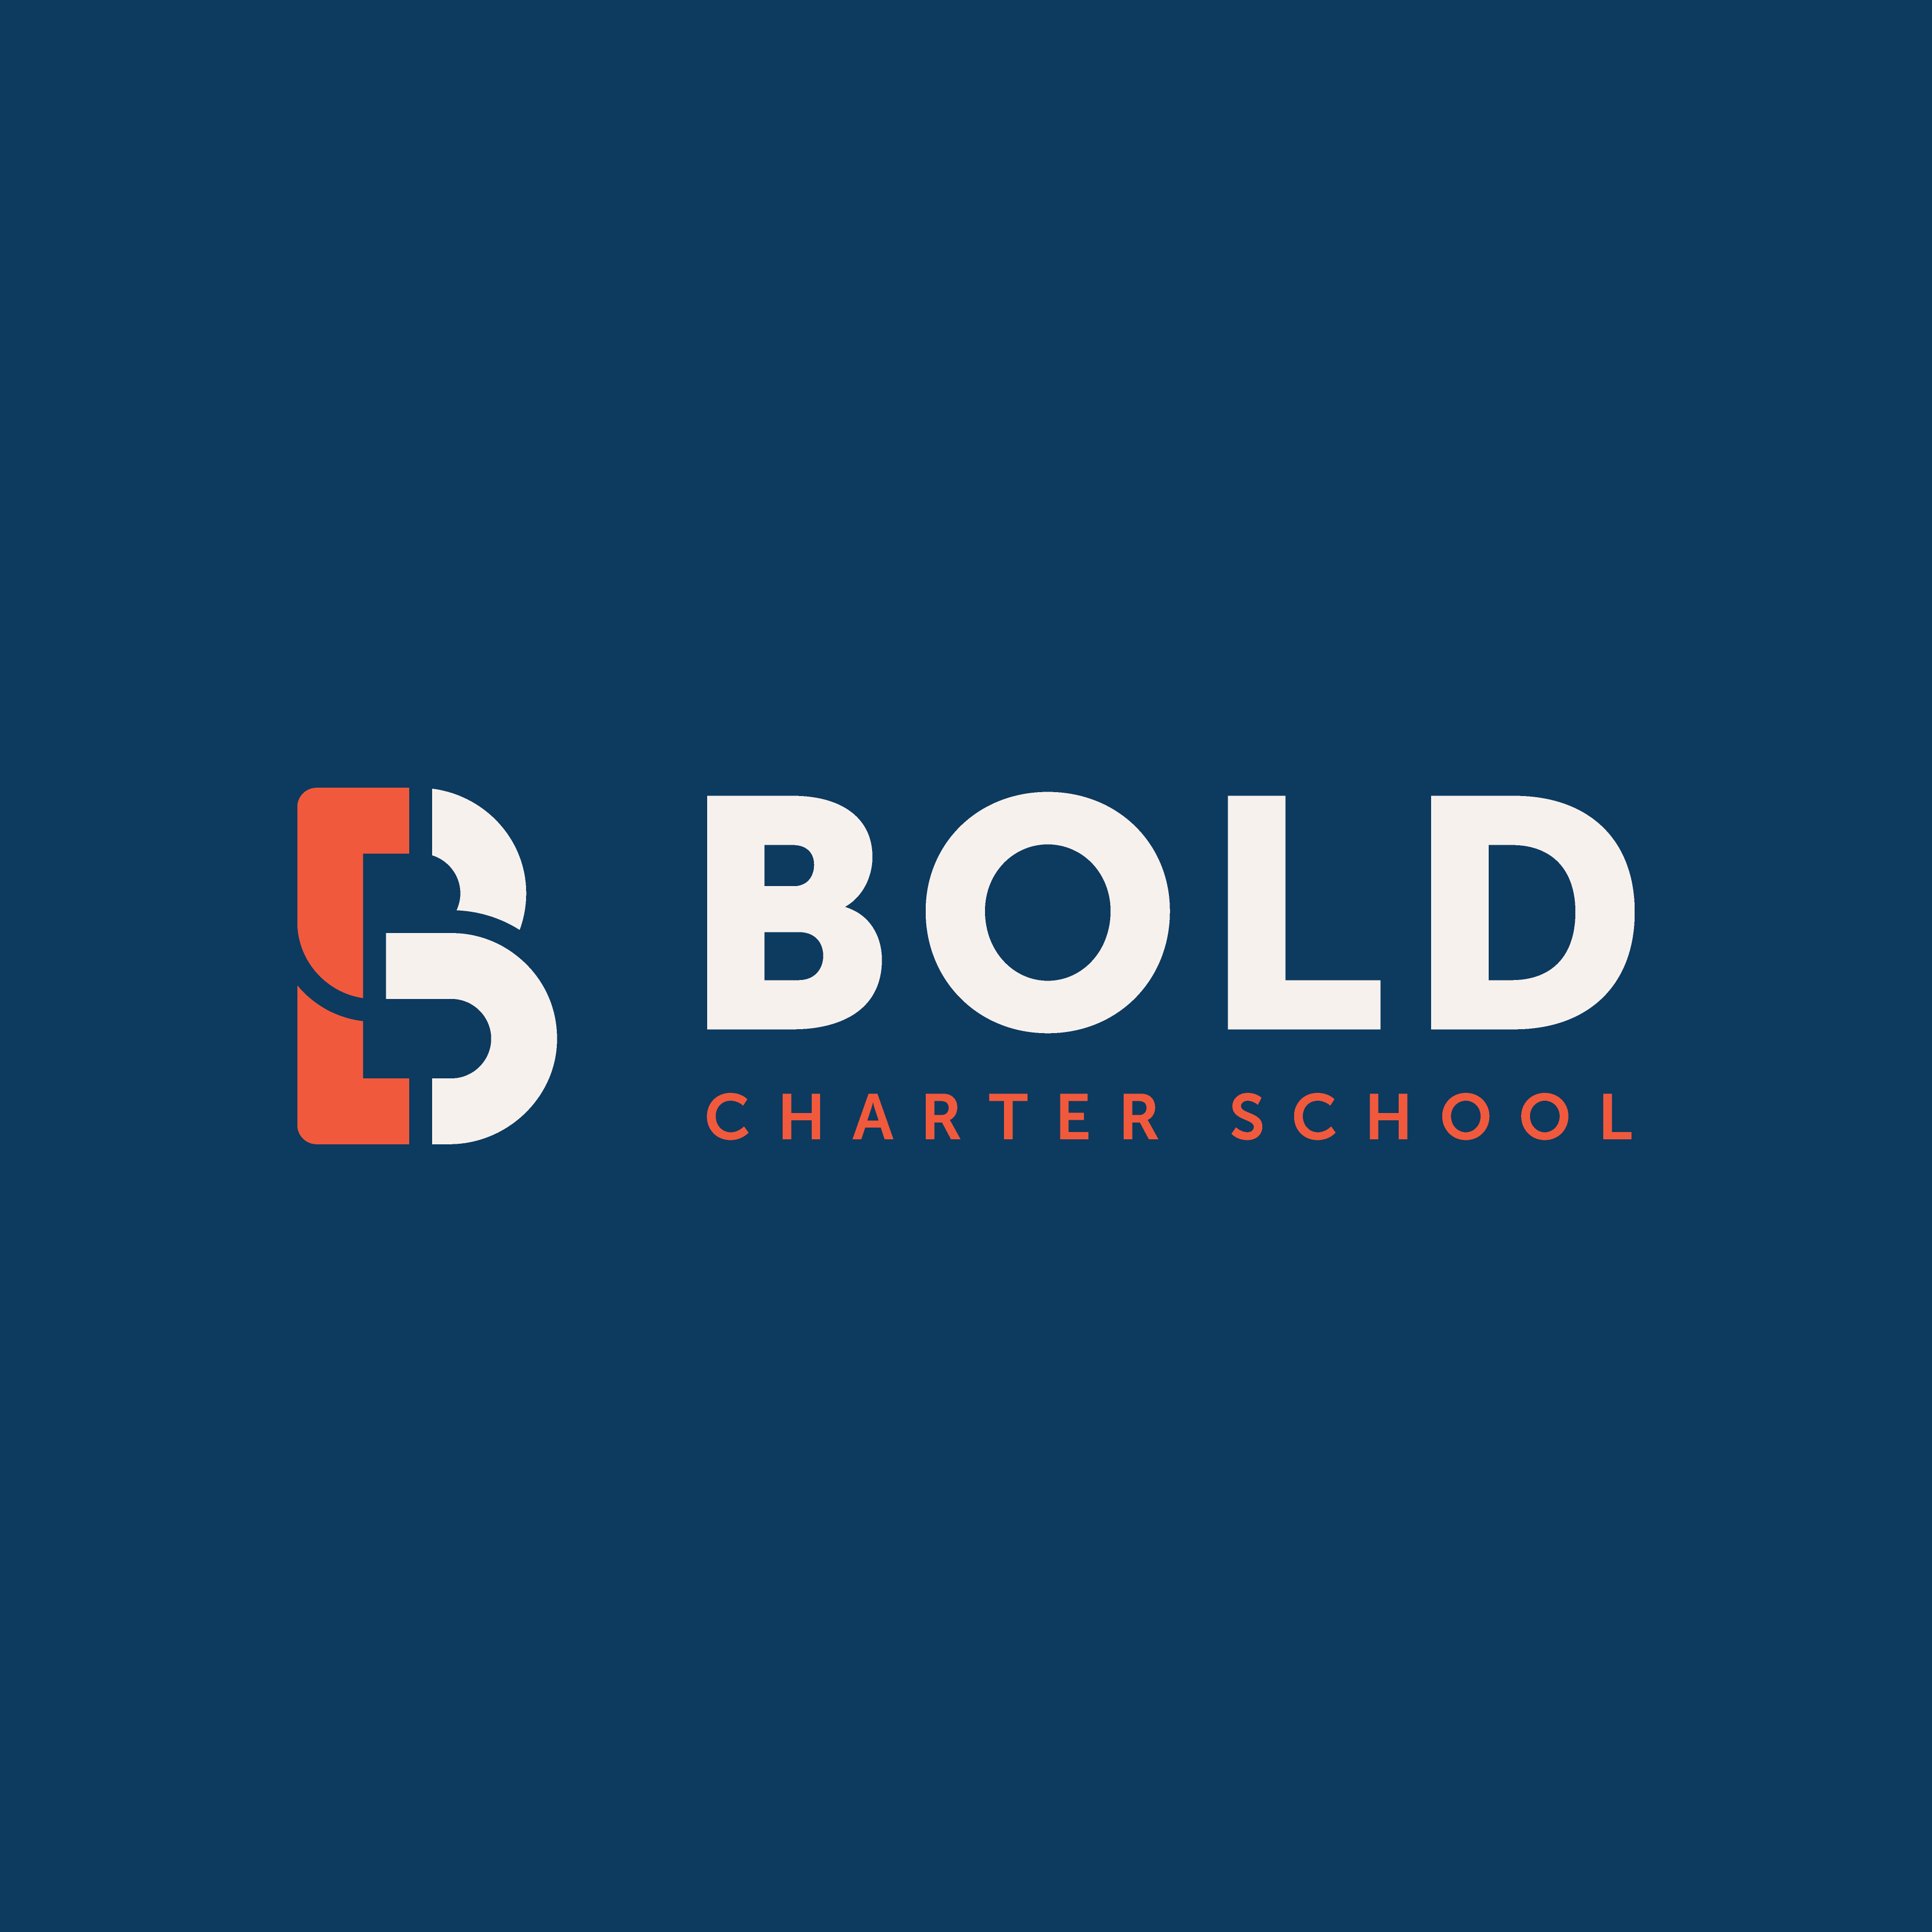 Bold Charter School in Bronx, New York Designer: Katie Cooper Monogram B Branding, Brand Identity